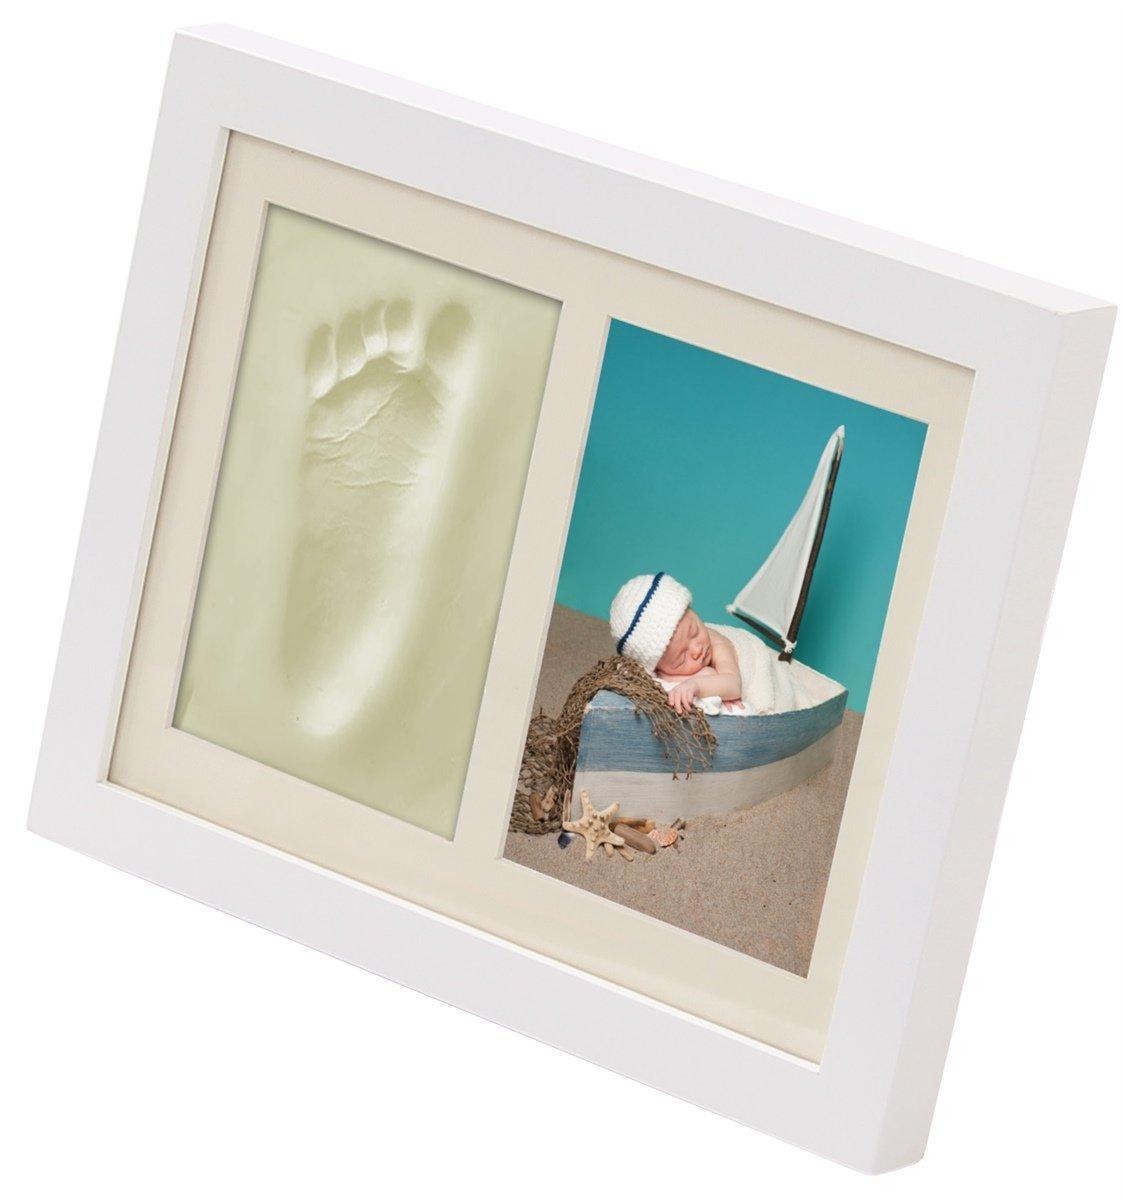 Baby 3D Gipsabdruck Handabdruck Fußabdruck Abdruck Set Fotorahmen ...